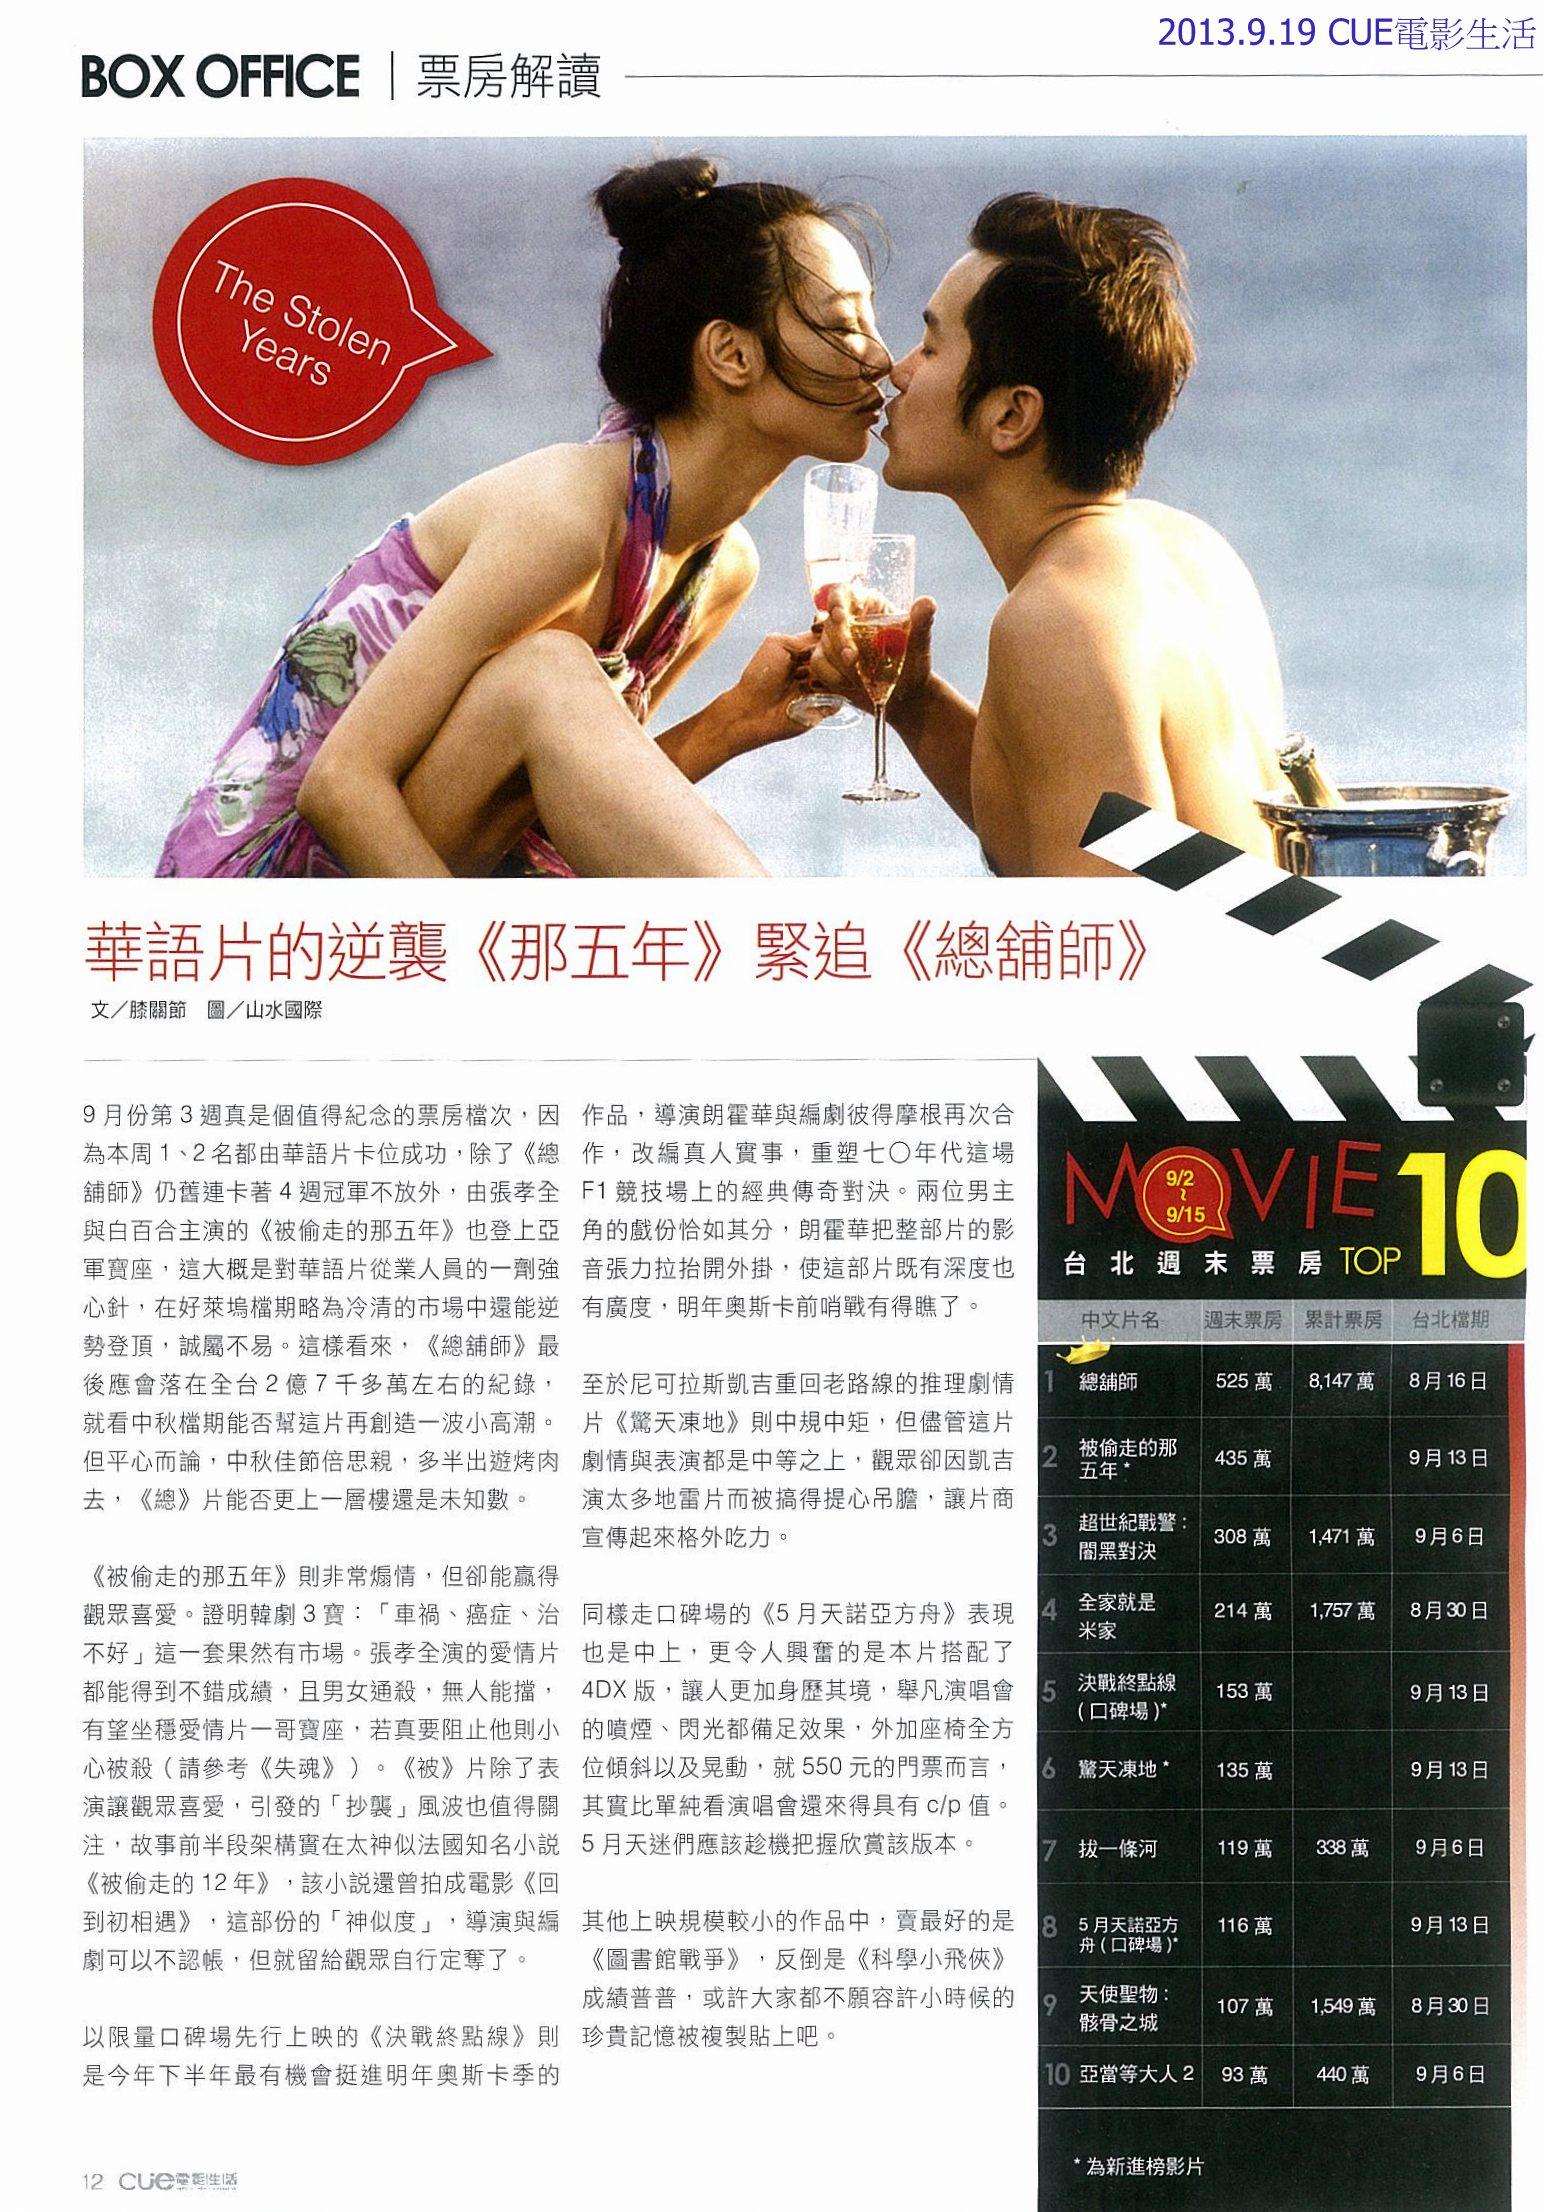 MG露出_2013.09.19_《被偷走的那五年》_CUE電影生活_華語片的逆襲《那五年》緊追《總鋪師》